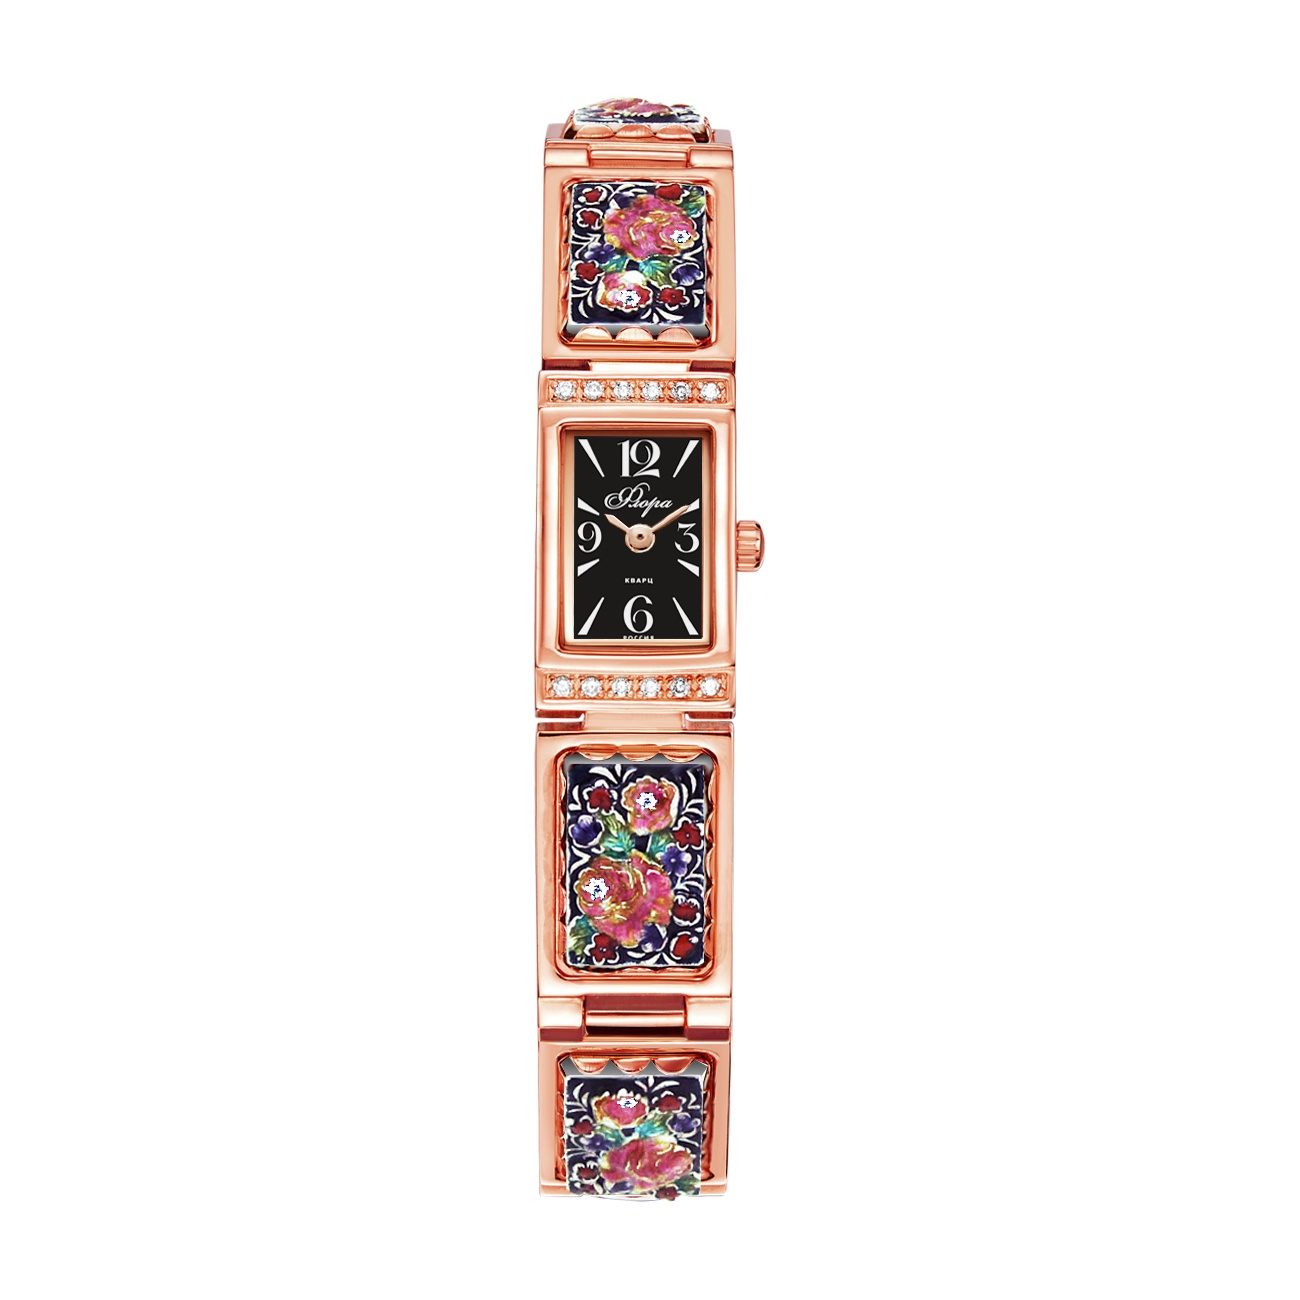 Часы Mikhail Moskvin 1141S5-B8B3 Борислава-2 будильник кварцевый mikhail moskvin цвет синий 2815 2